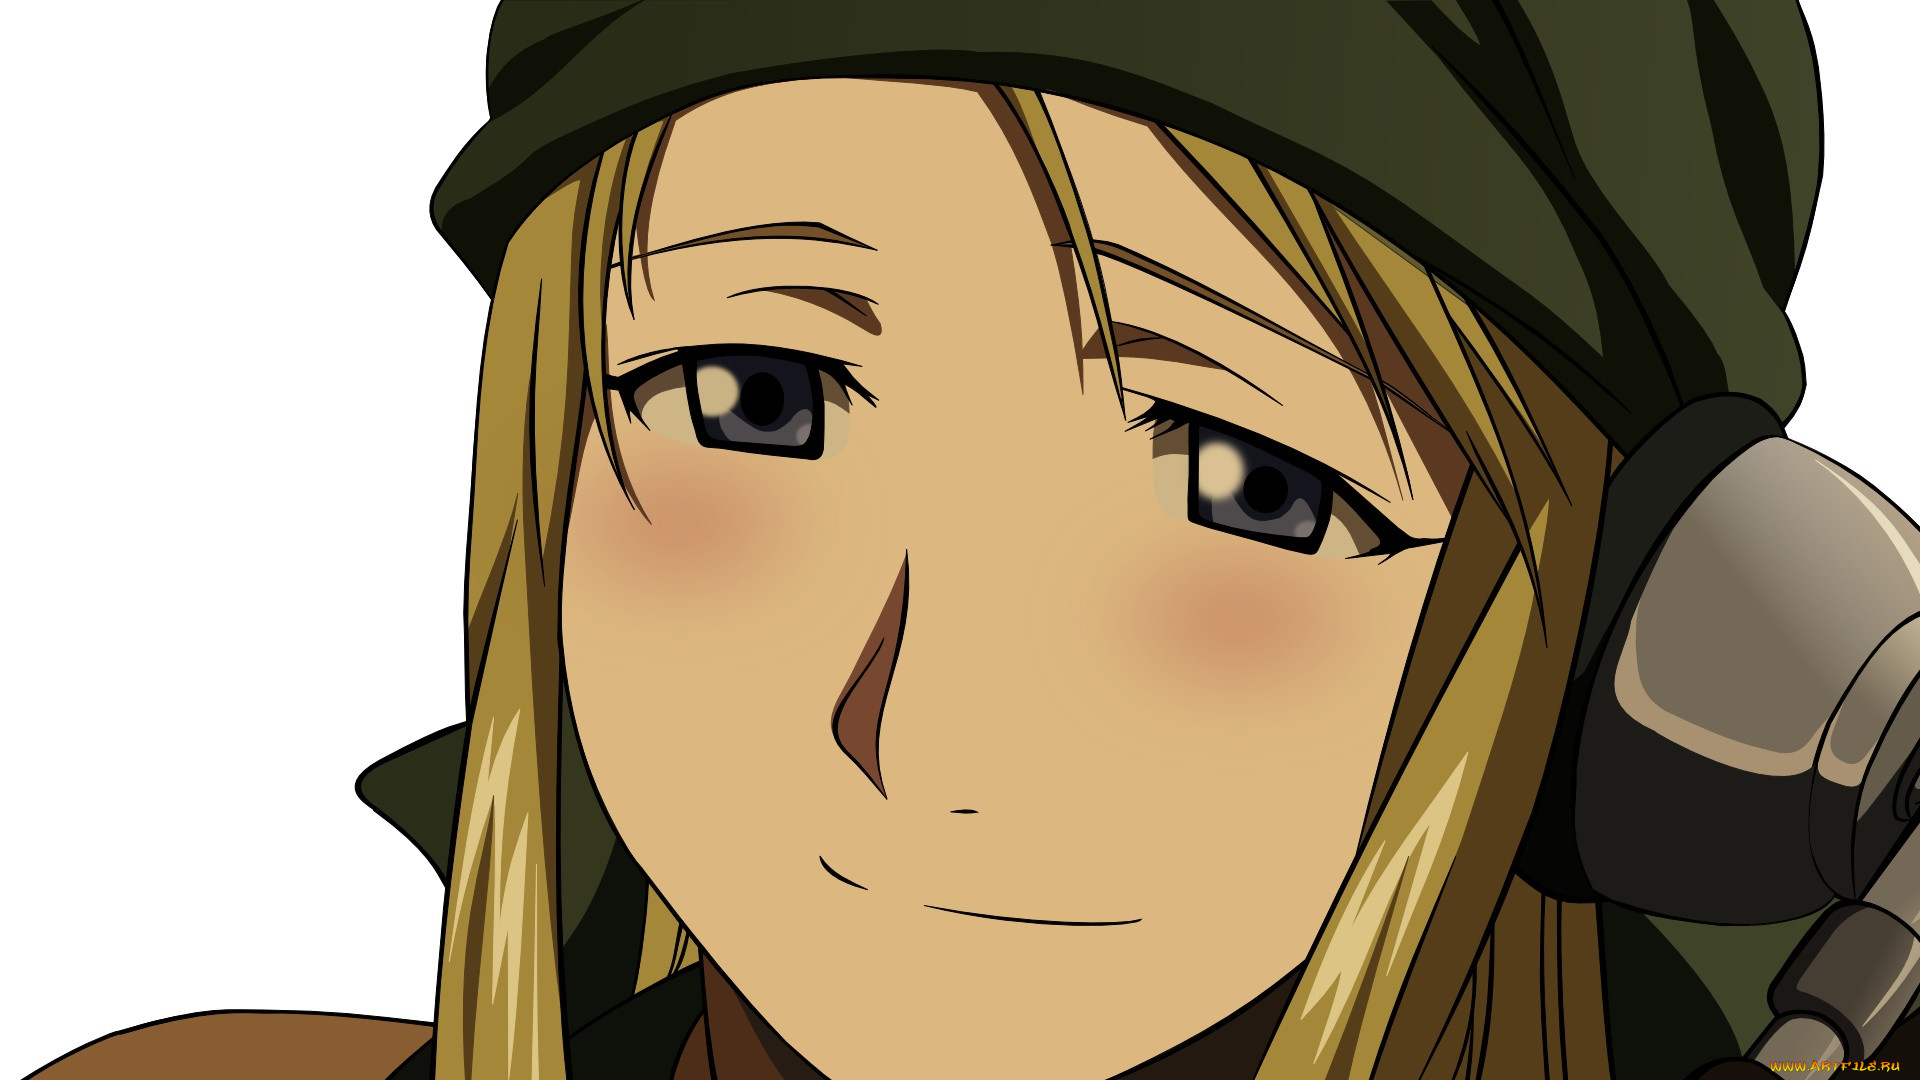 fullmetal alchemist, аниме, персонаж